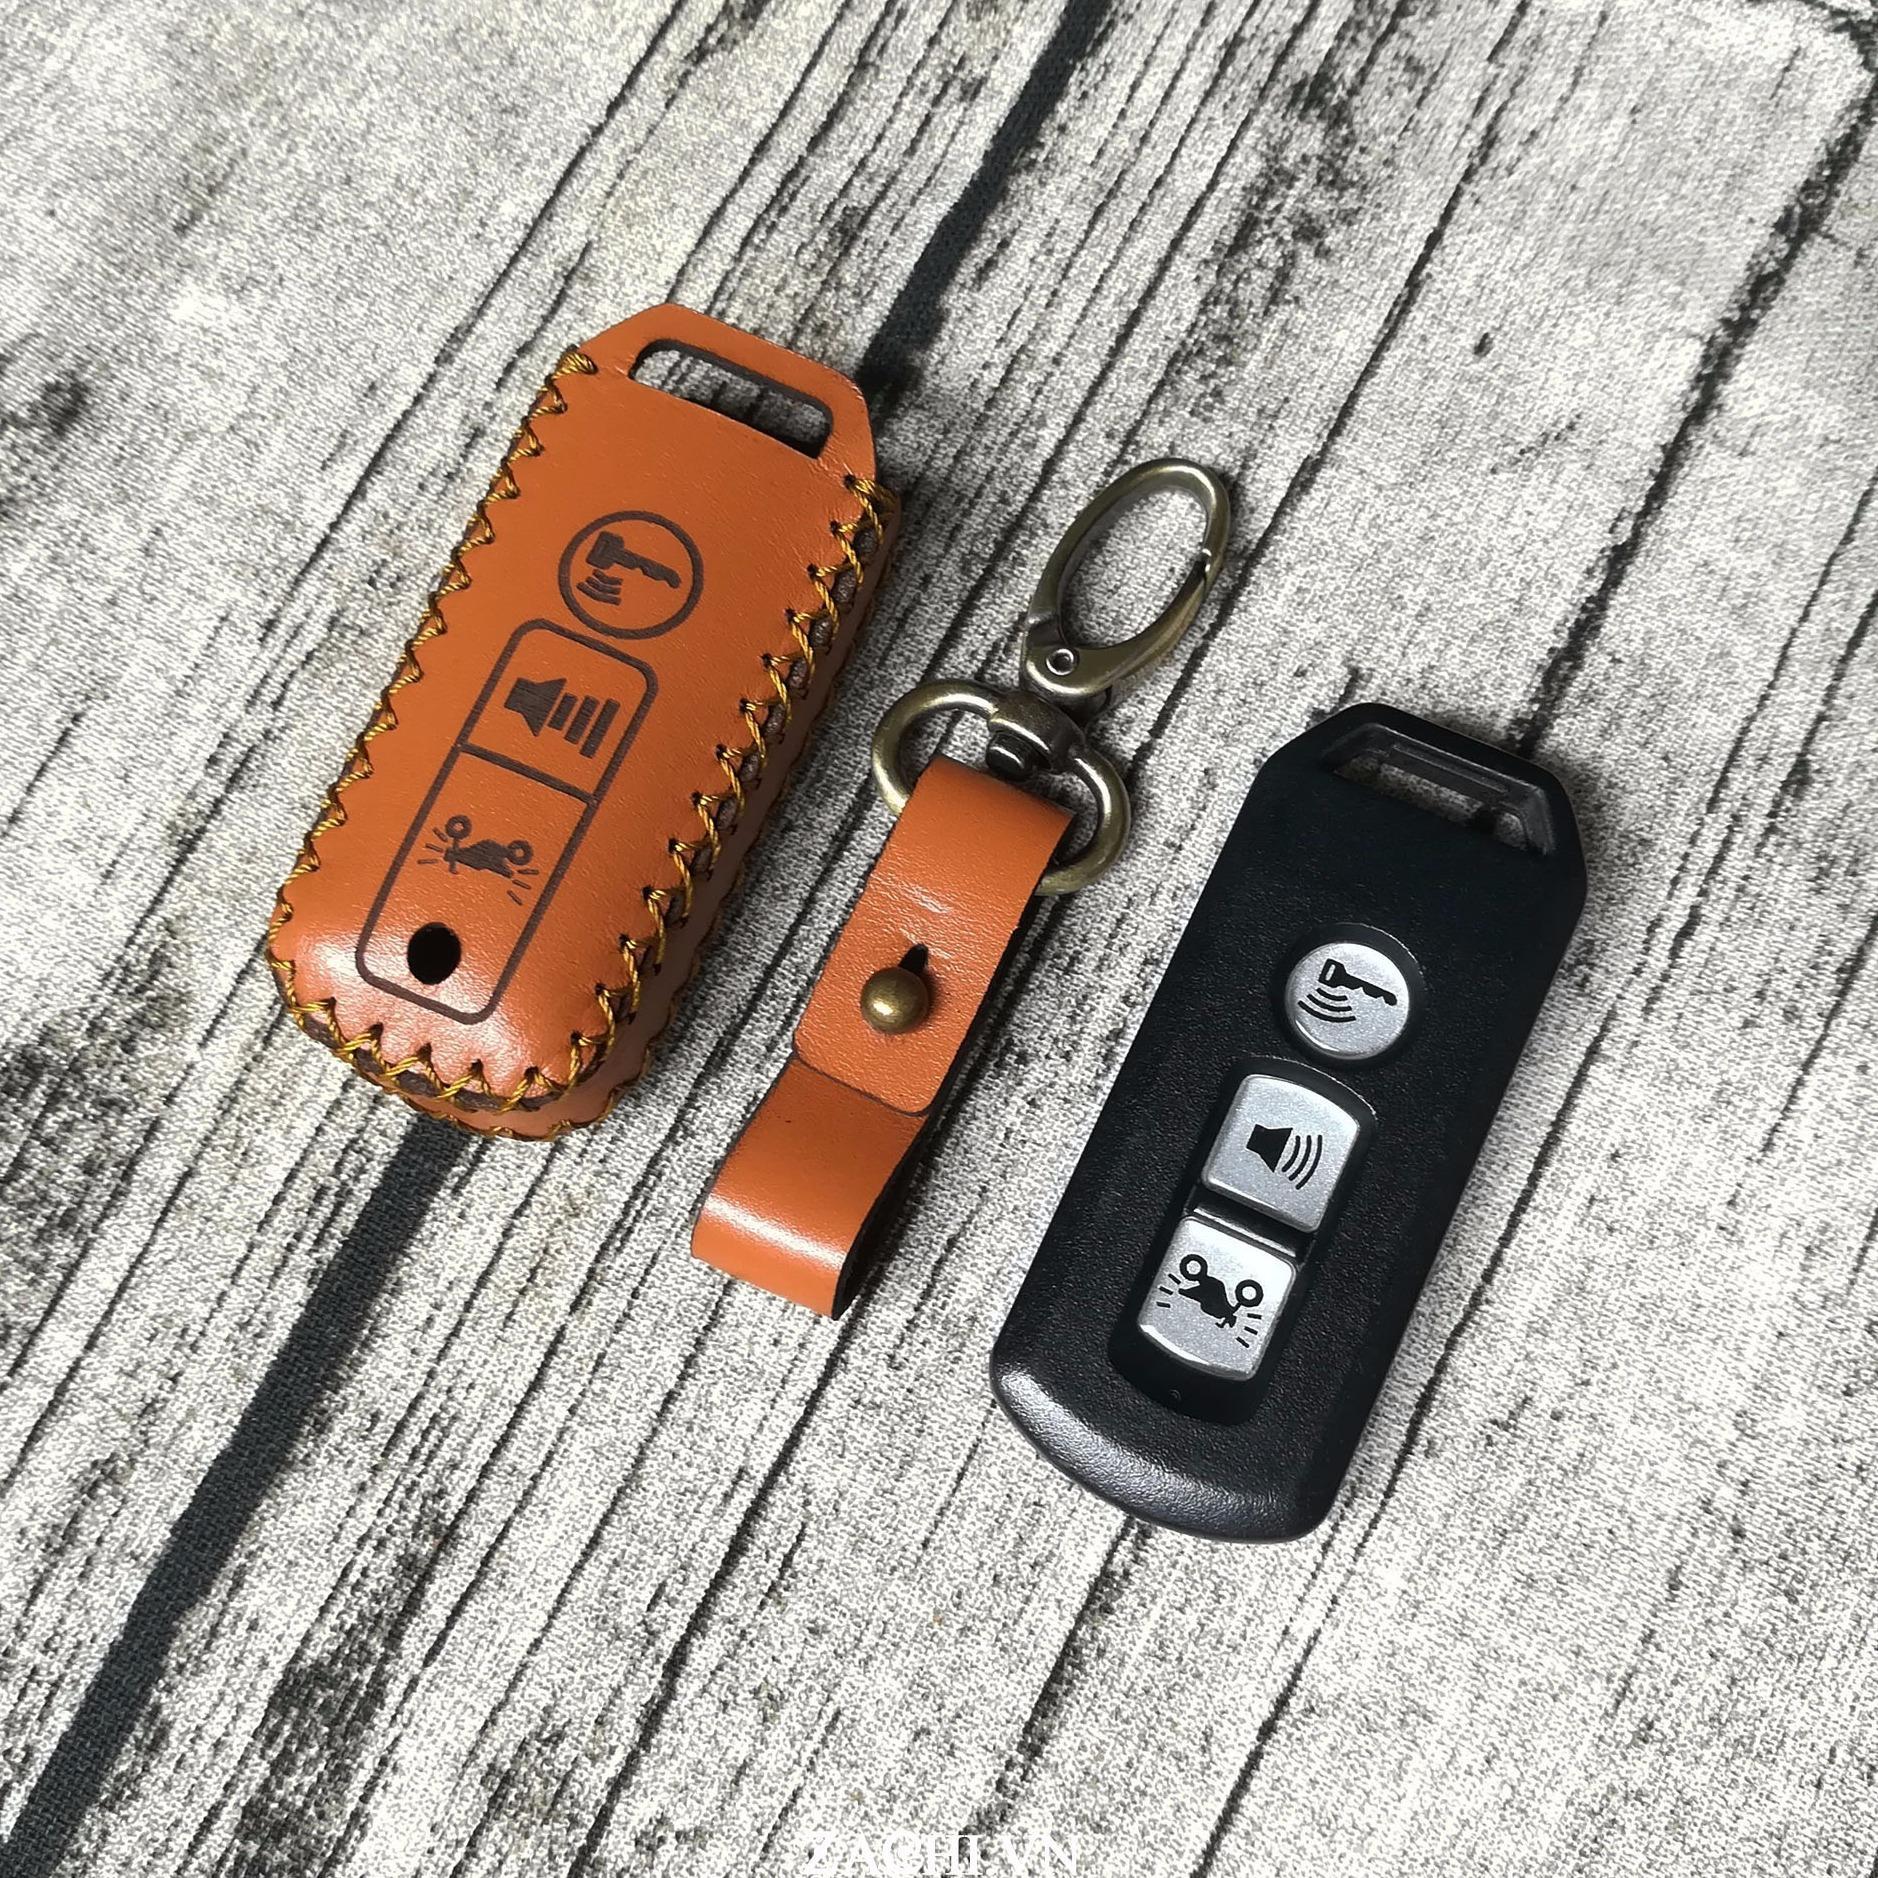 Giá Bán Bao Da Moc Khoa Xe Sh Smart Key